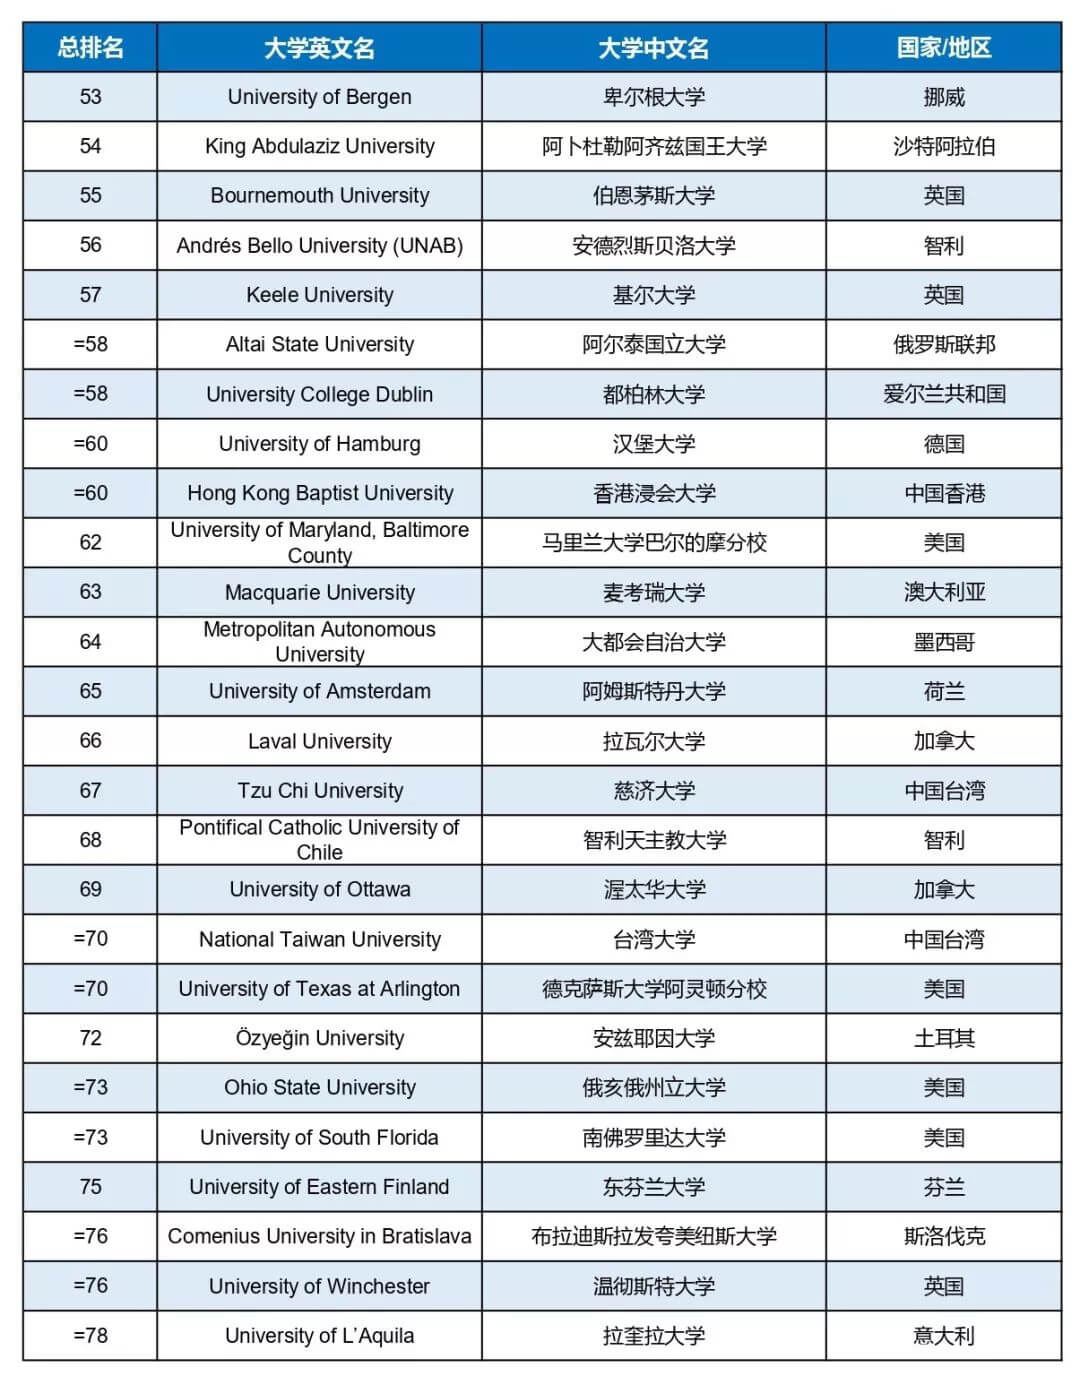 2019Times世界大学社会影响力排名发布!英美高校无缘前三